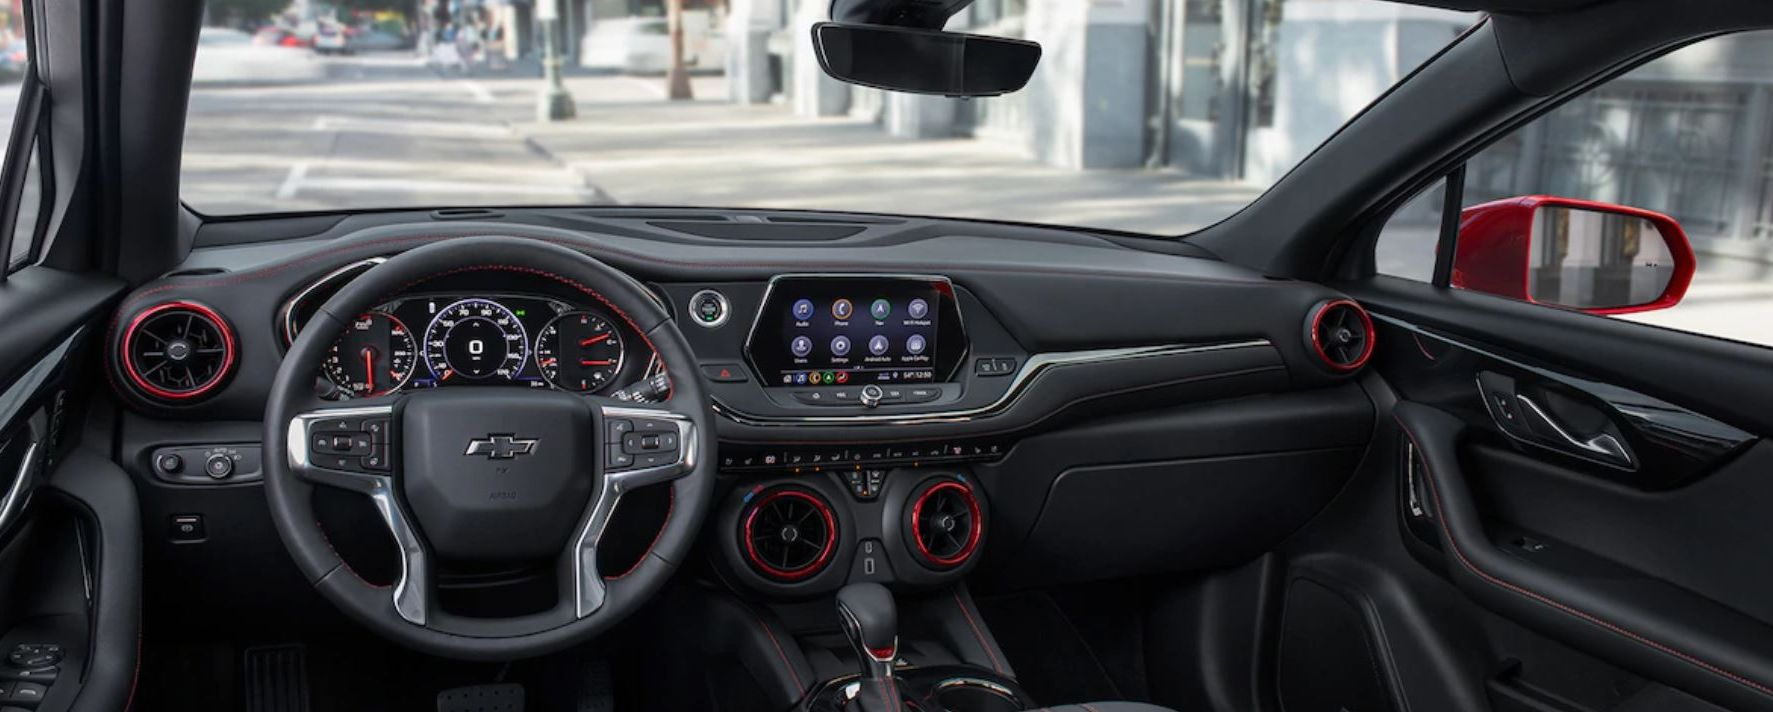 2019 Chevrolet Blazer Dashboard